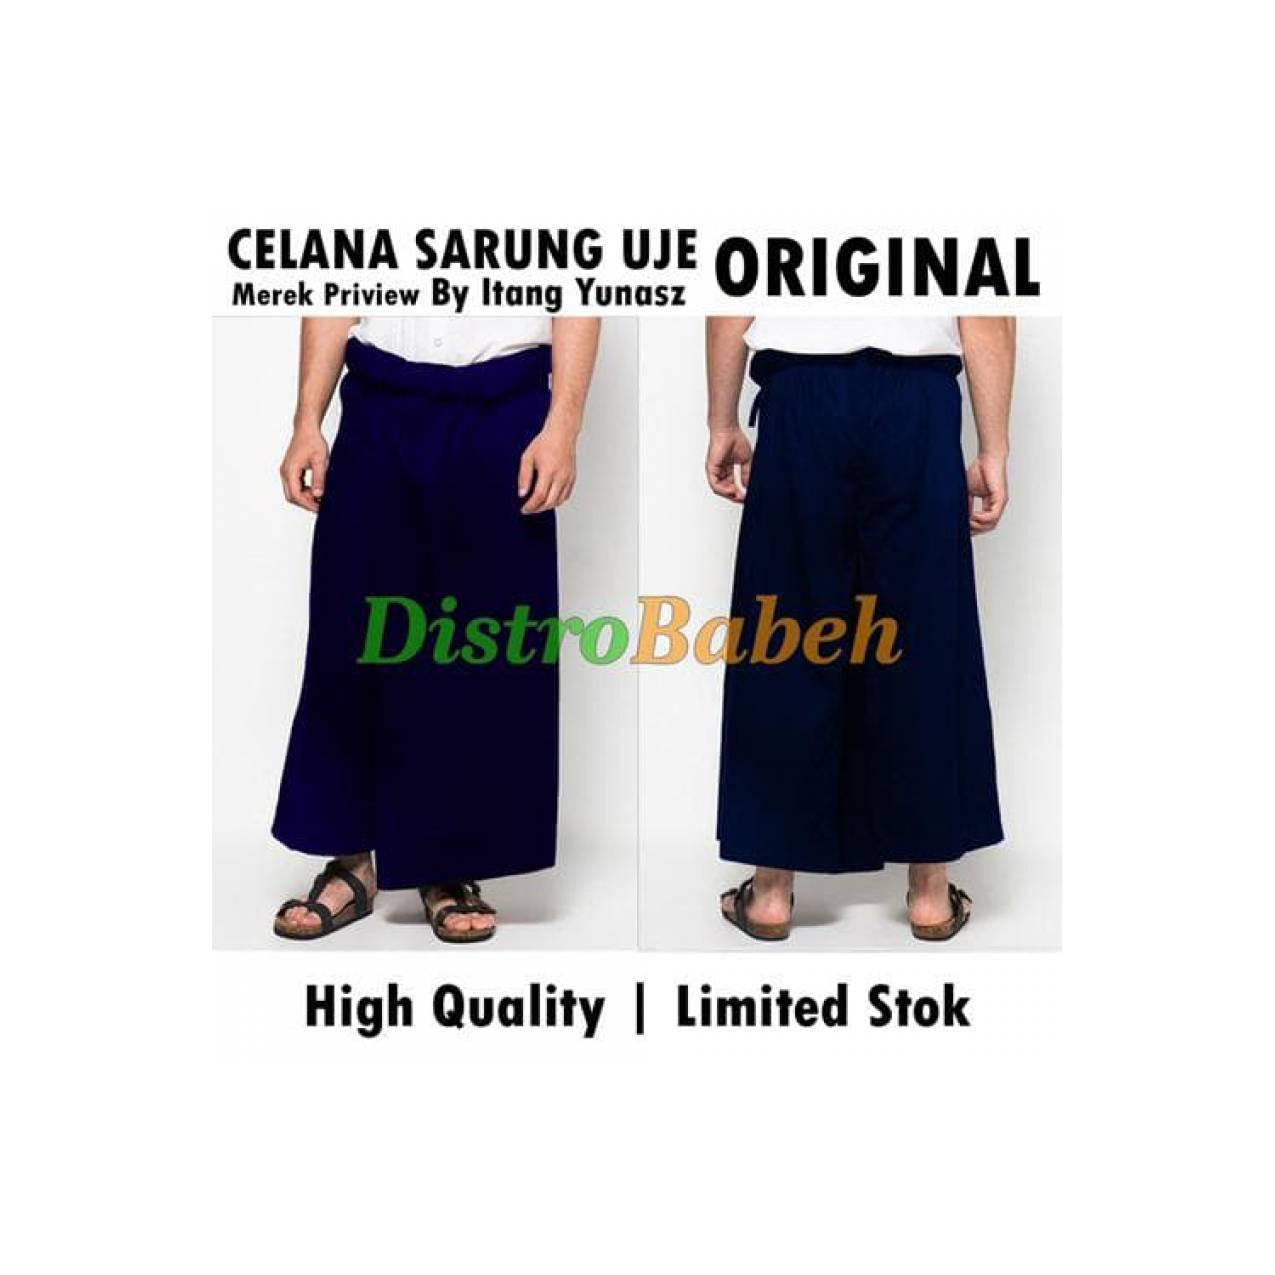 PROMO PRODUK Celana Sarung UJE | Warna DONGKER | Bawahan Baju Koko